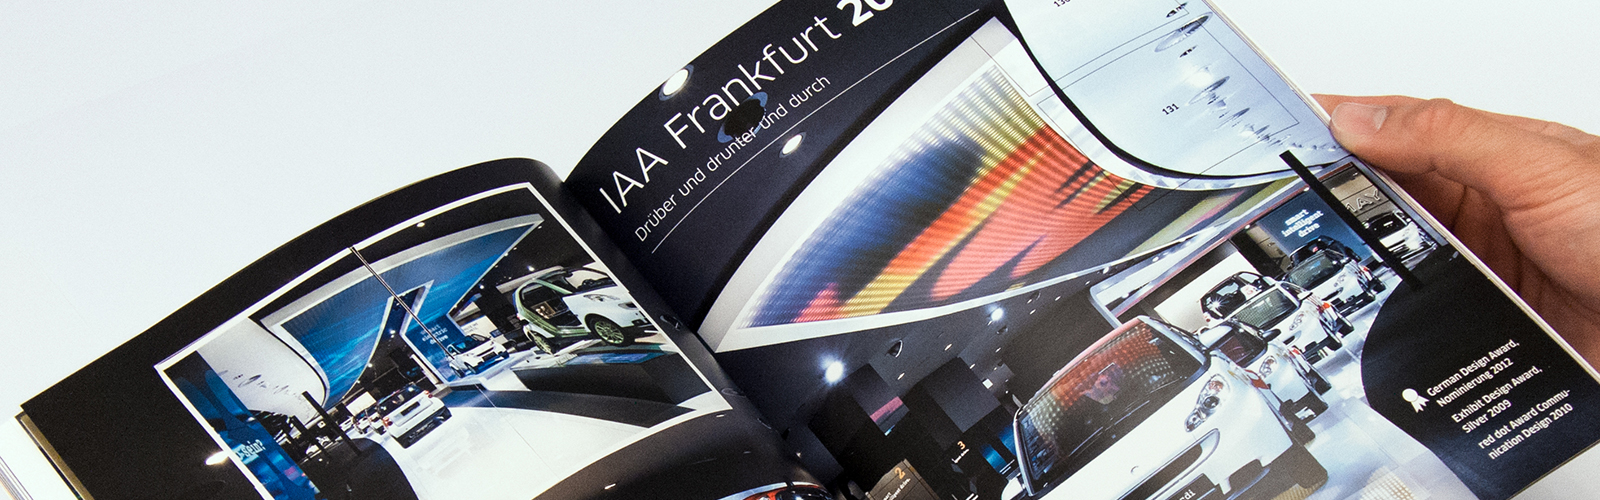 Braunwagner Communication Design smart 10 years magazine